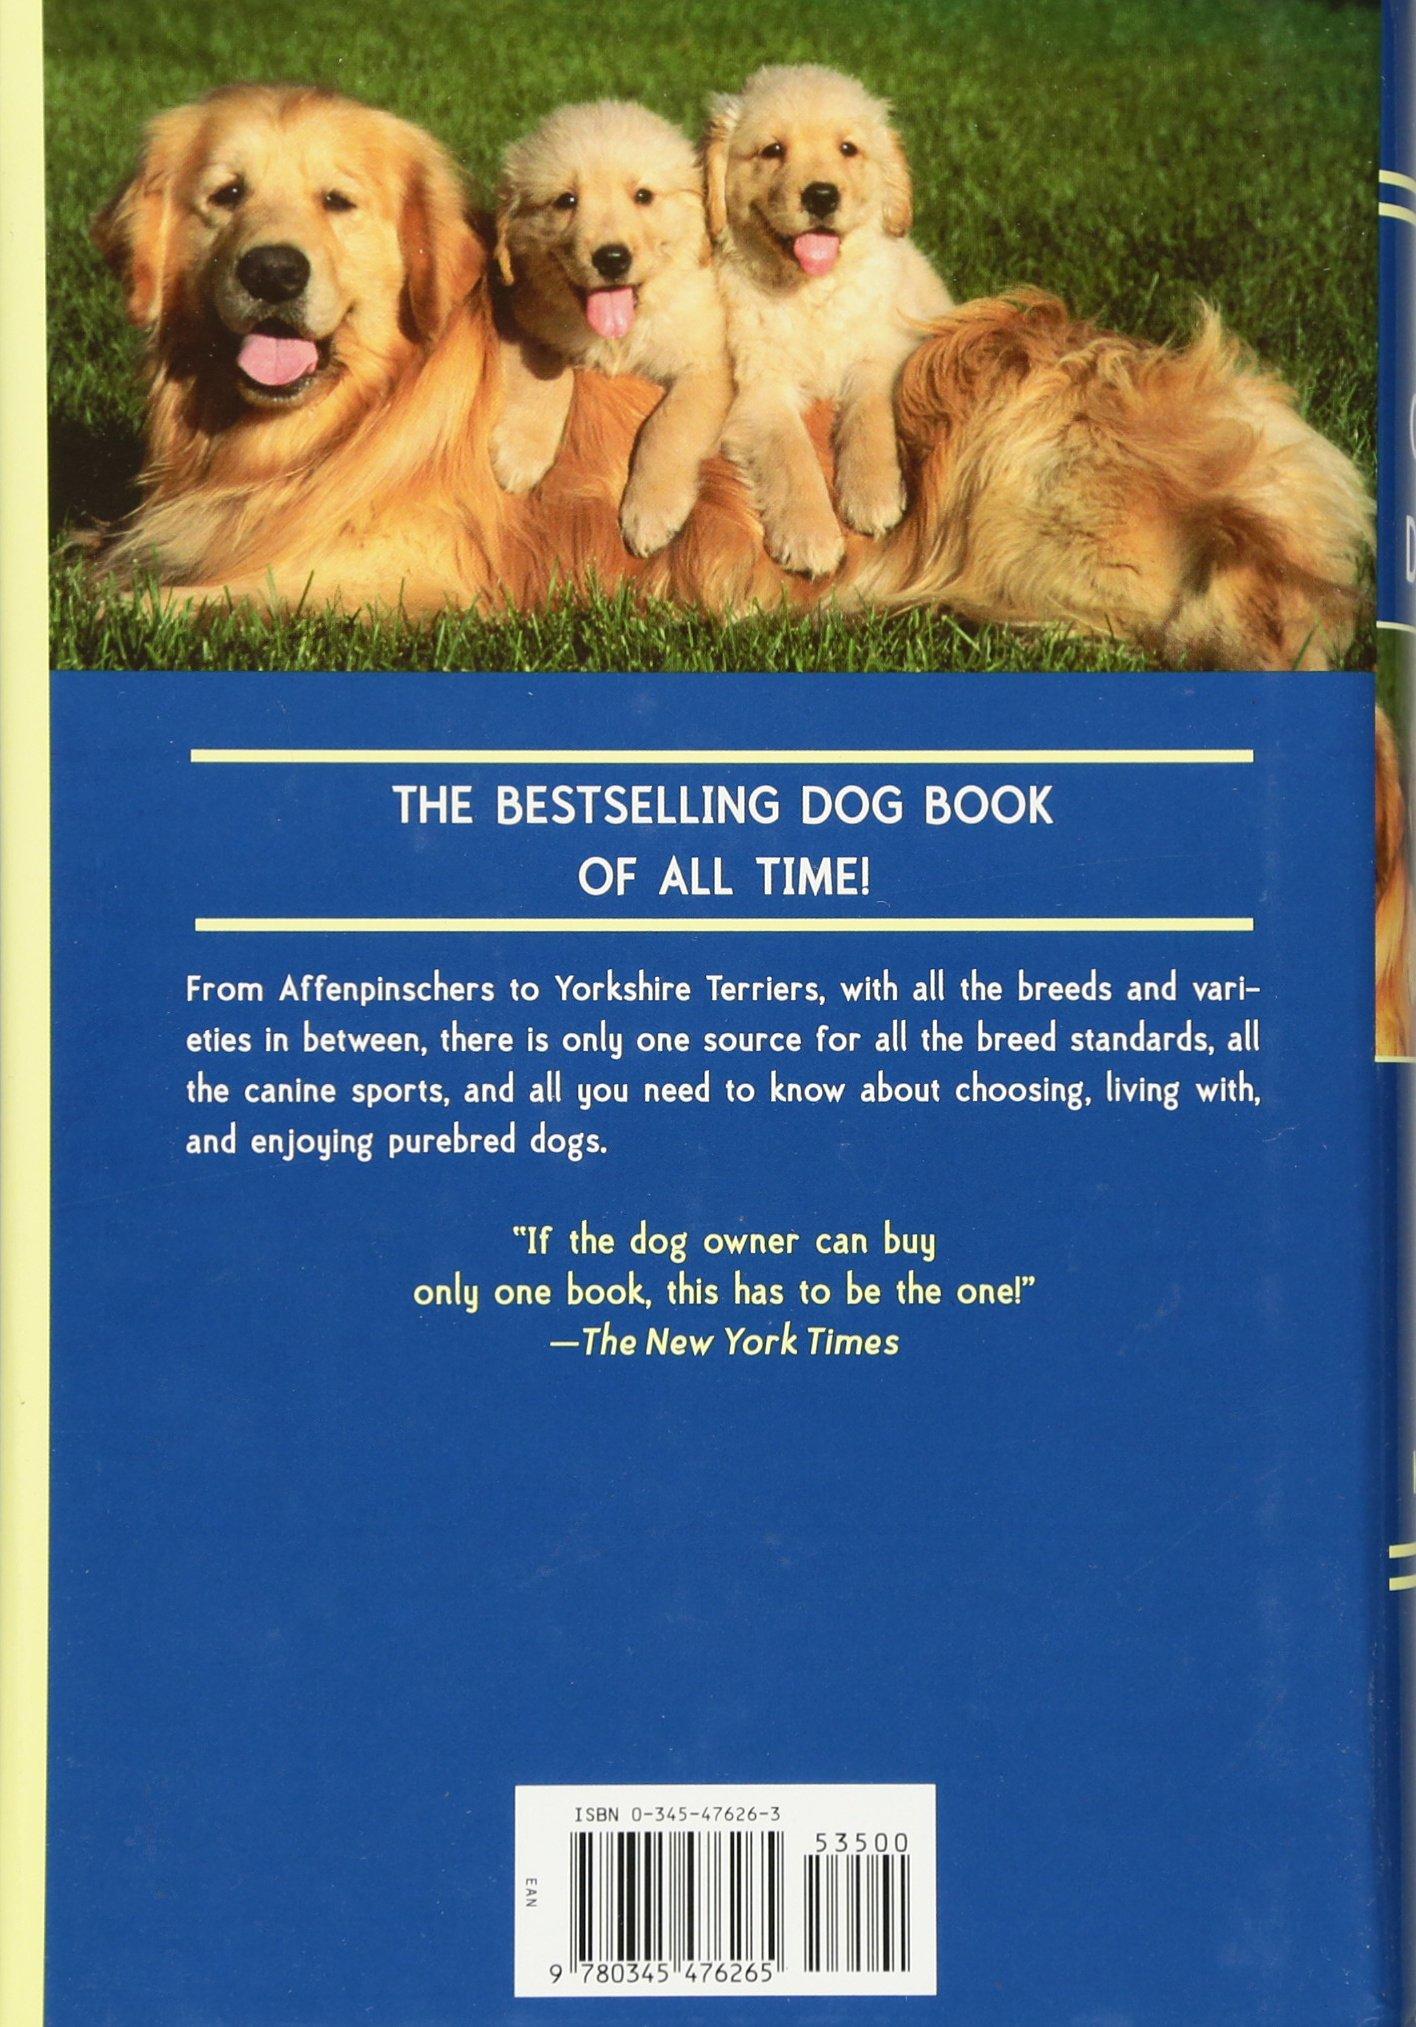 lg AKC Golden Retriever vinyl decal gundogs American Kennel Club Puppy